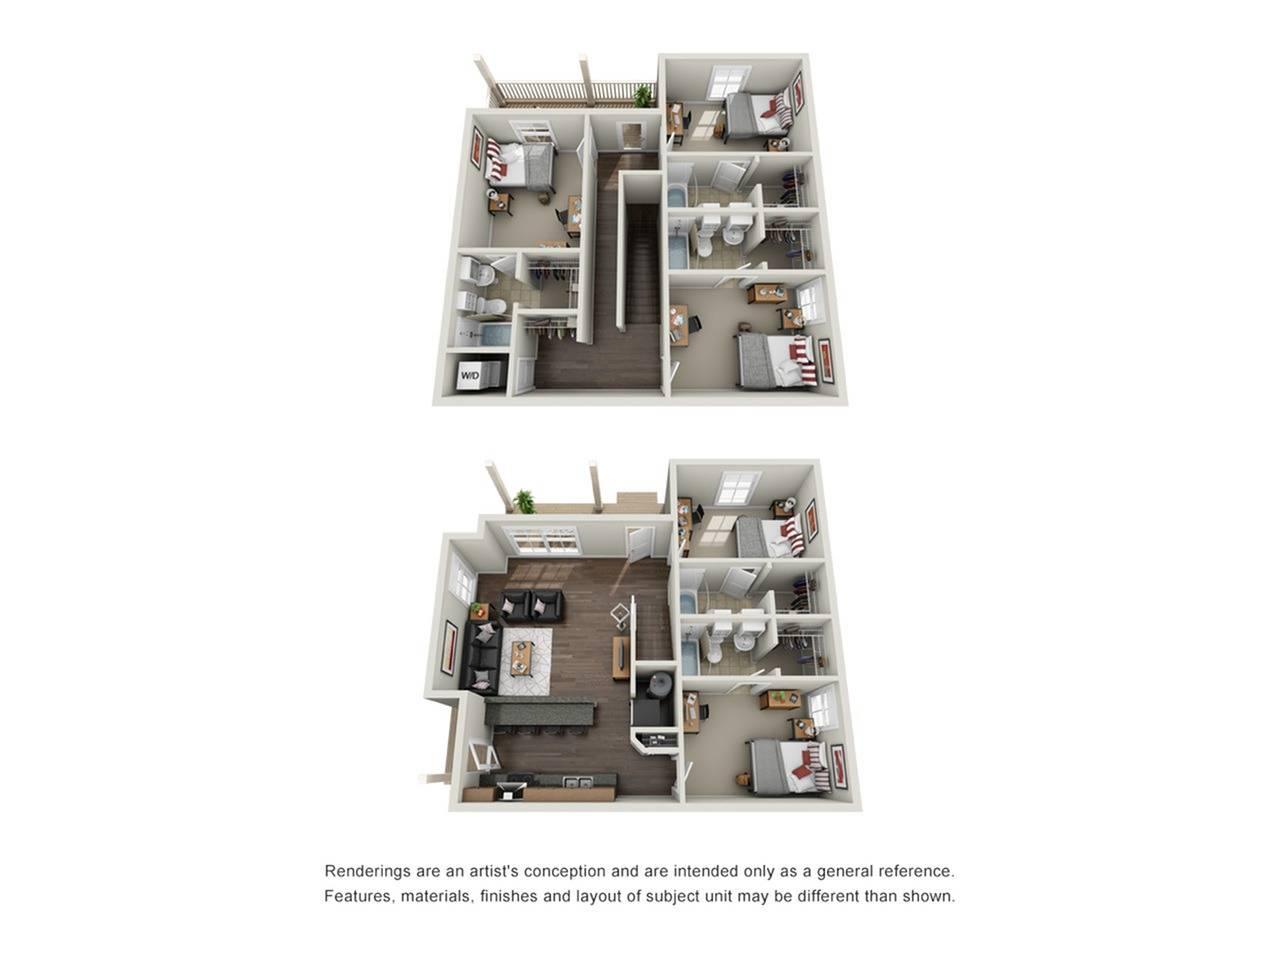 5 bedroom duplex unfurnished